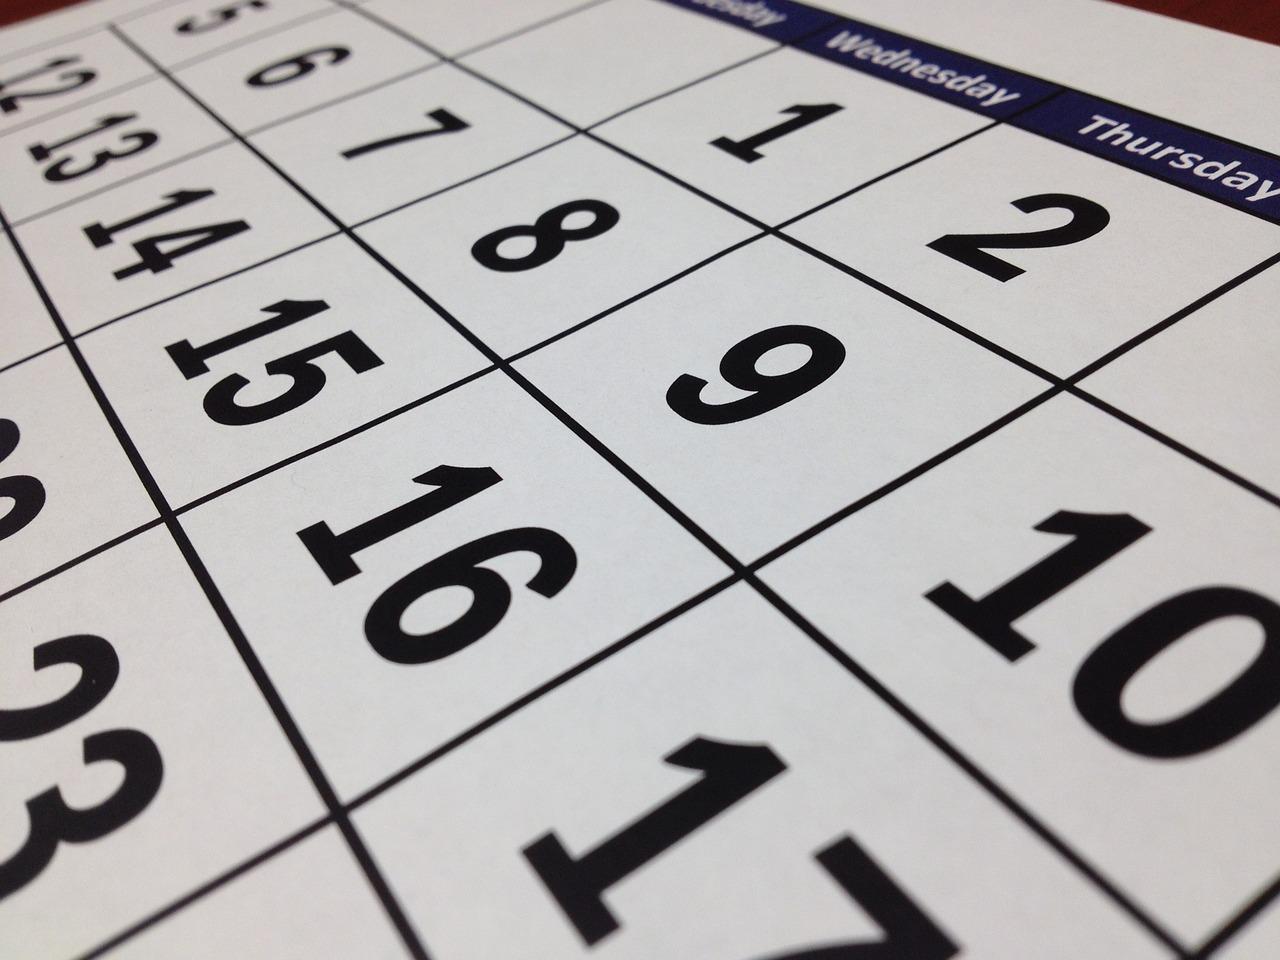 Kalender photo